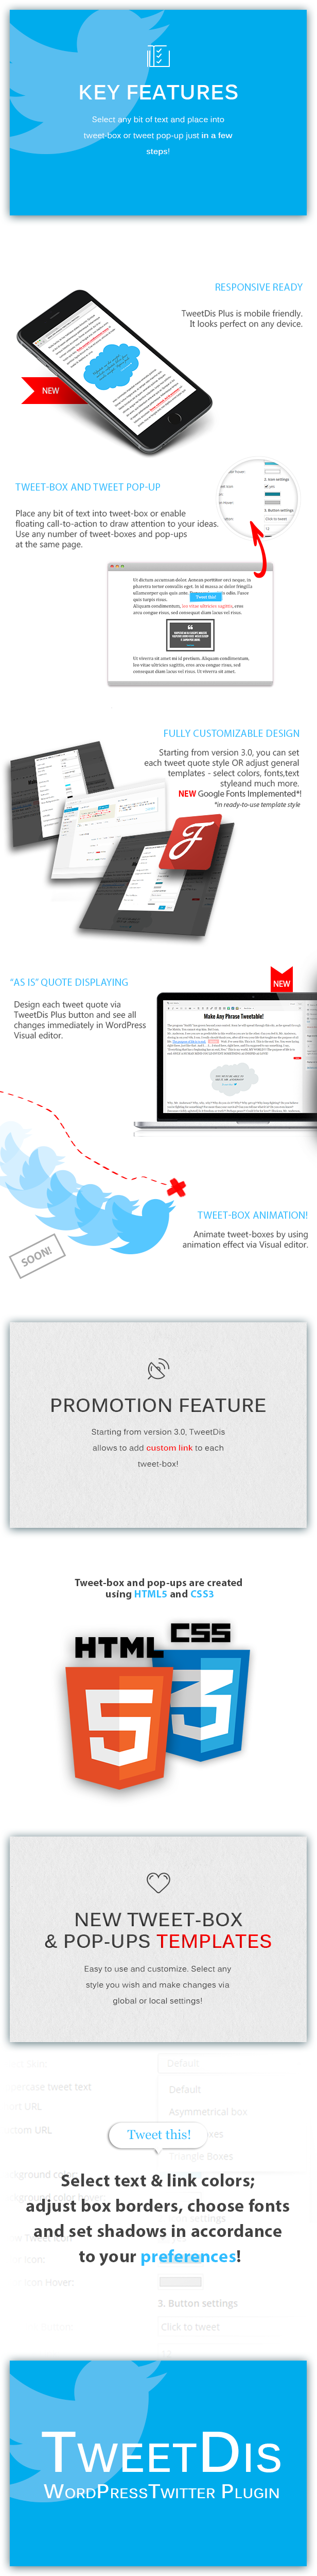 TweetDis - Herhangi Cümle Tweetable yap - 7